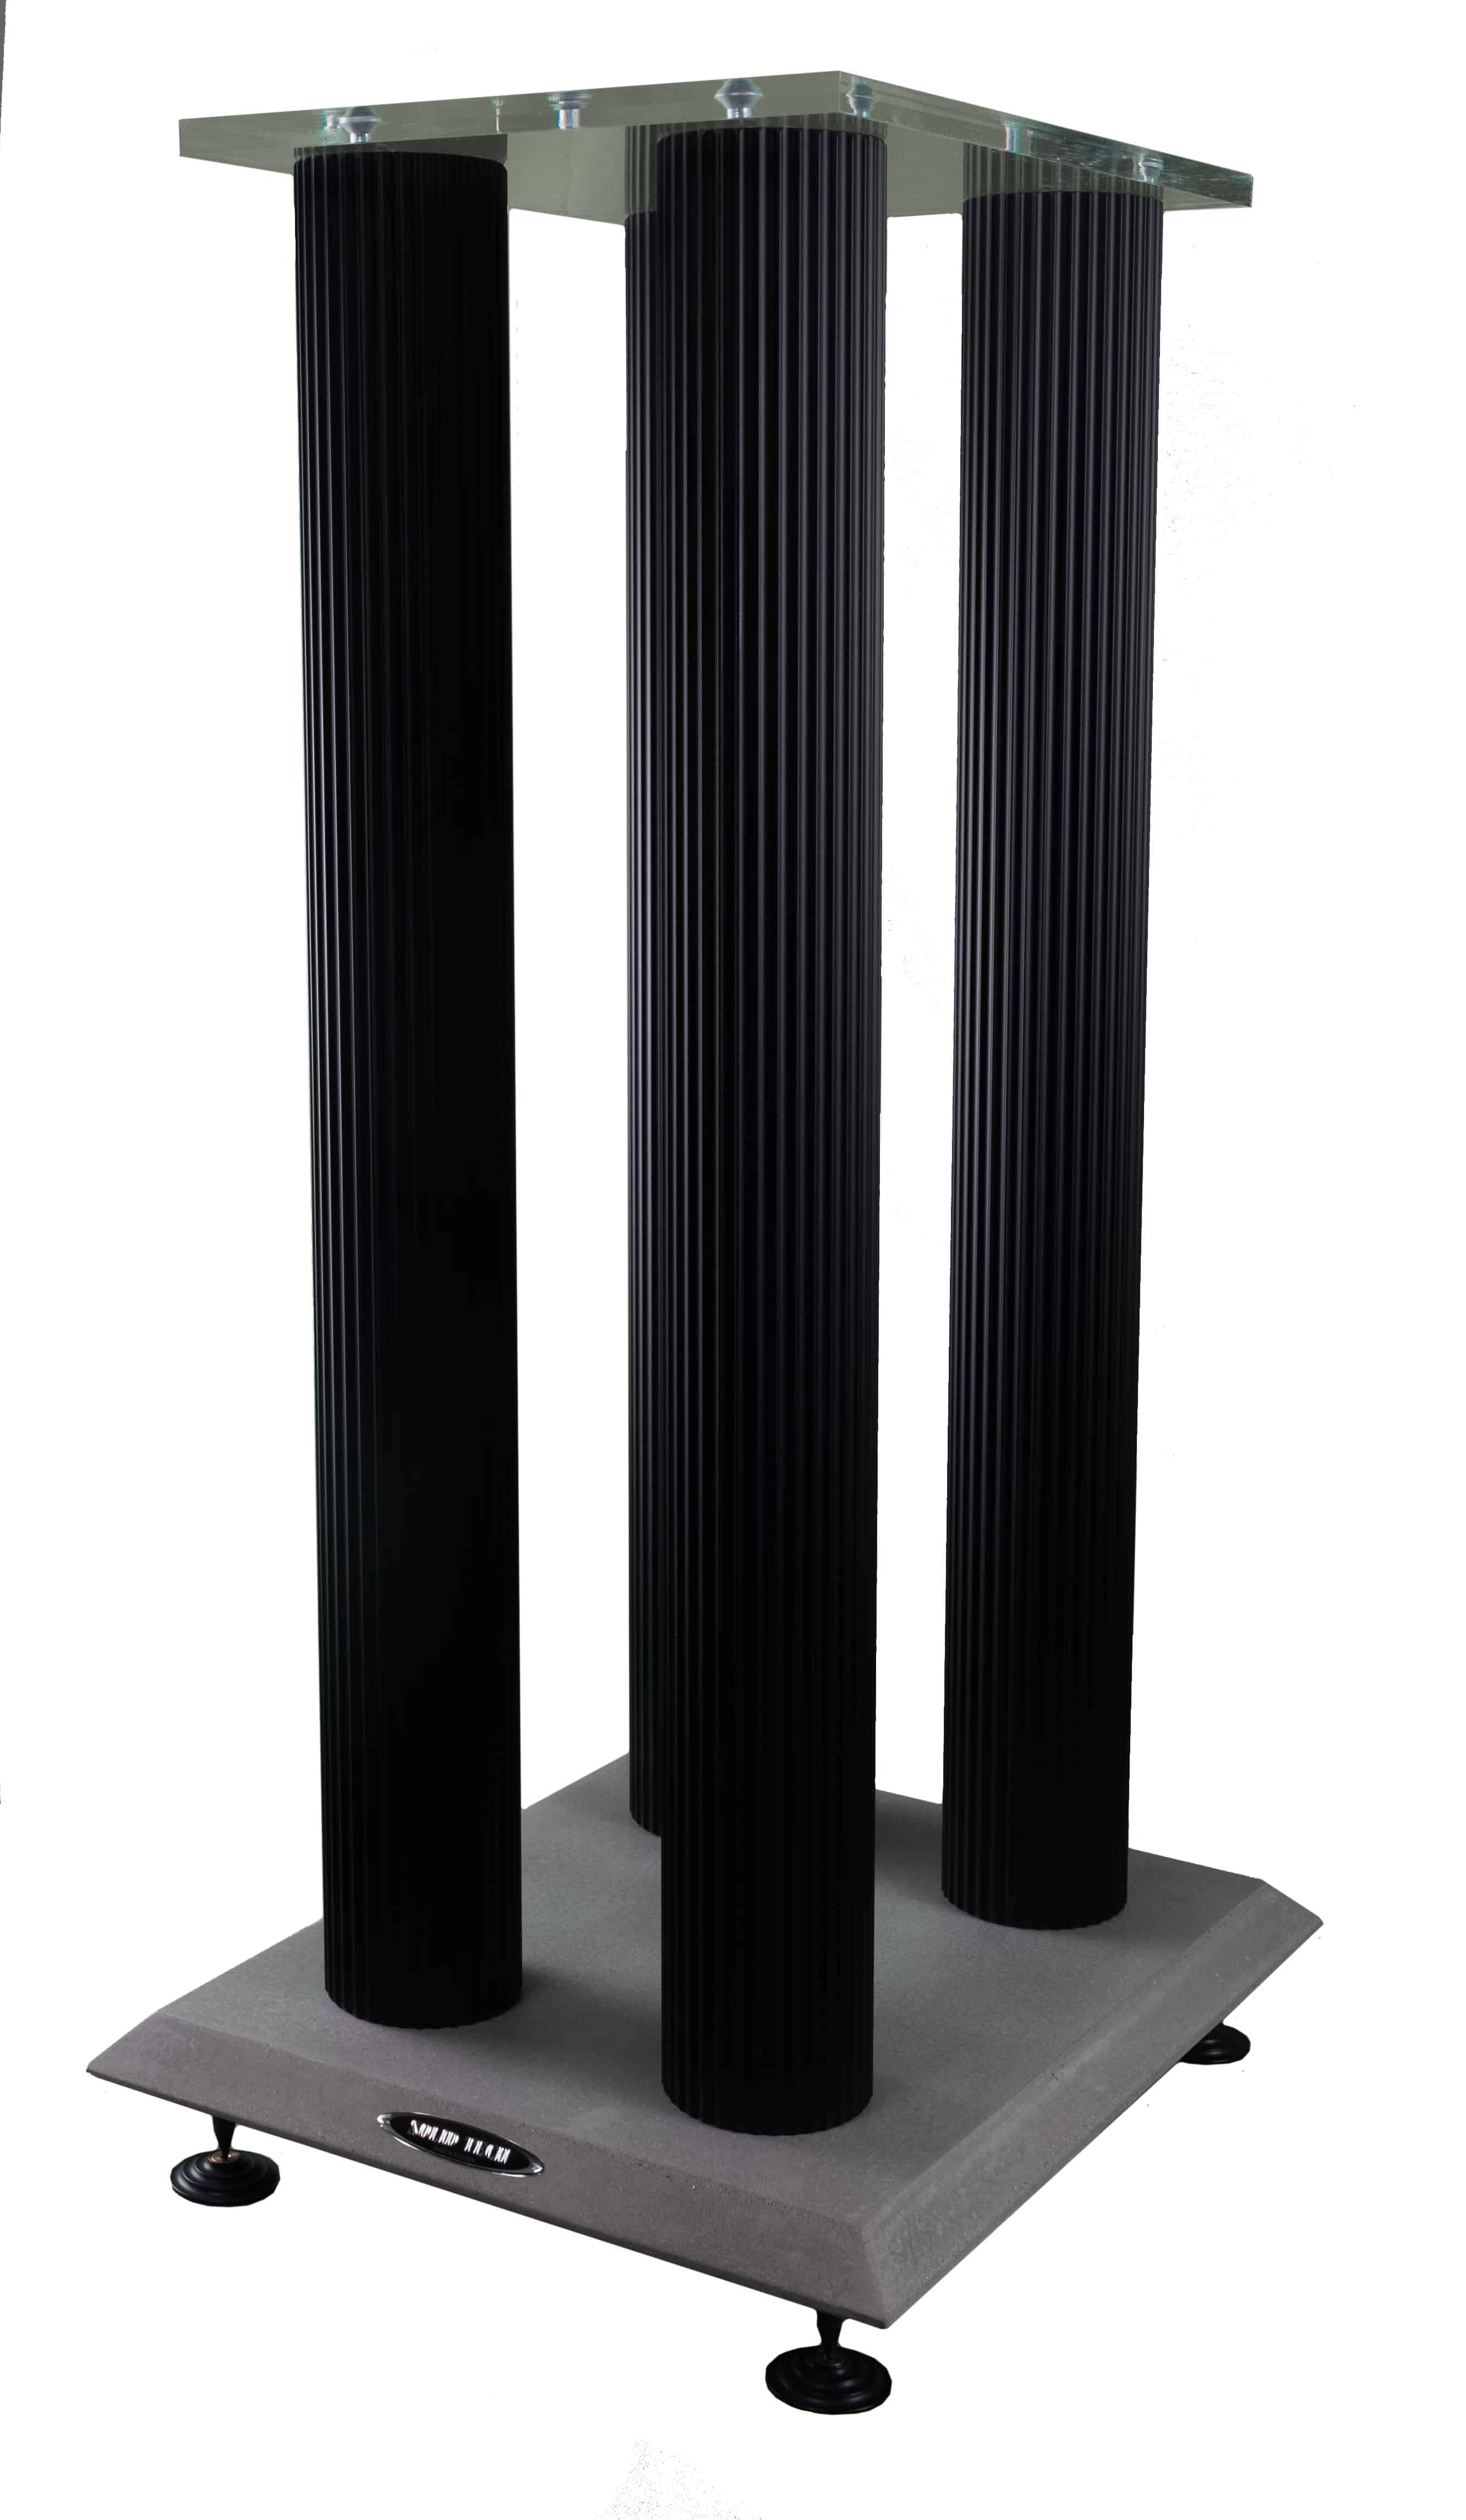 Loudspeaker Stand Model 4 Image